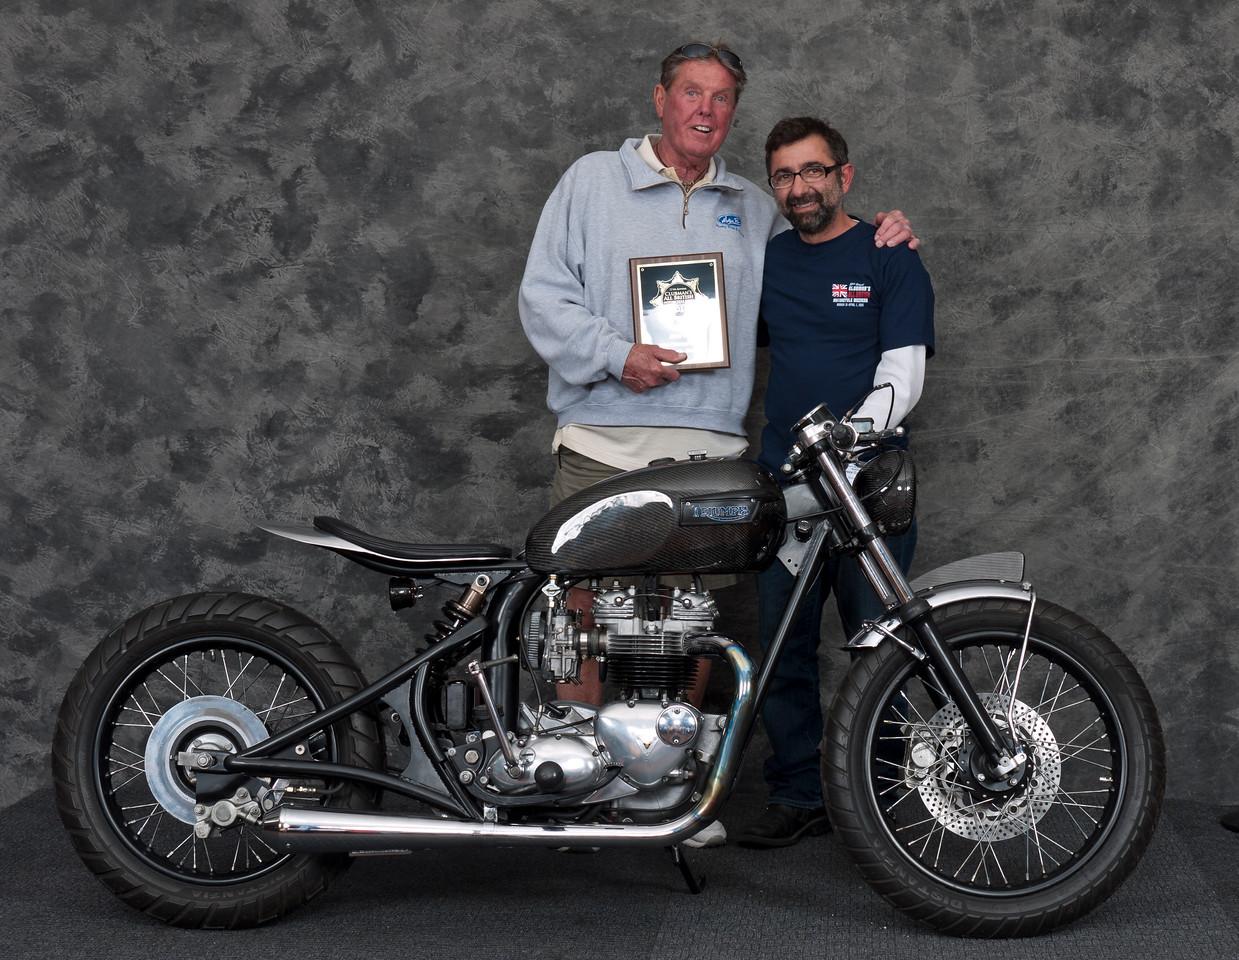 Reza Gohary, 1976 Triumph Bonneville special. Winner, Silver Star Award